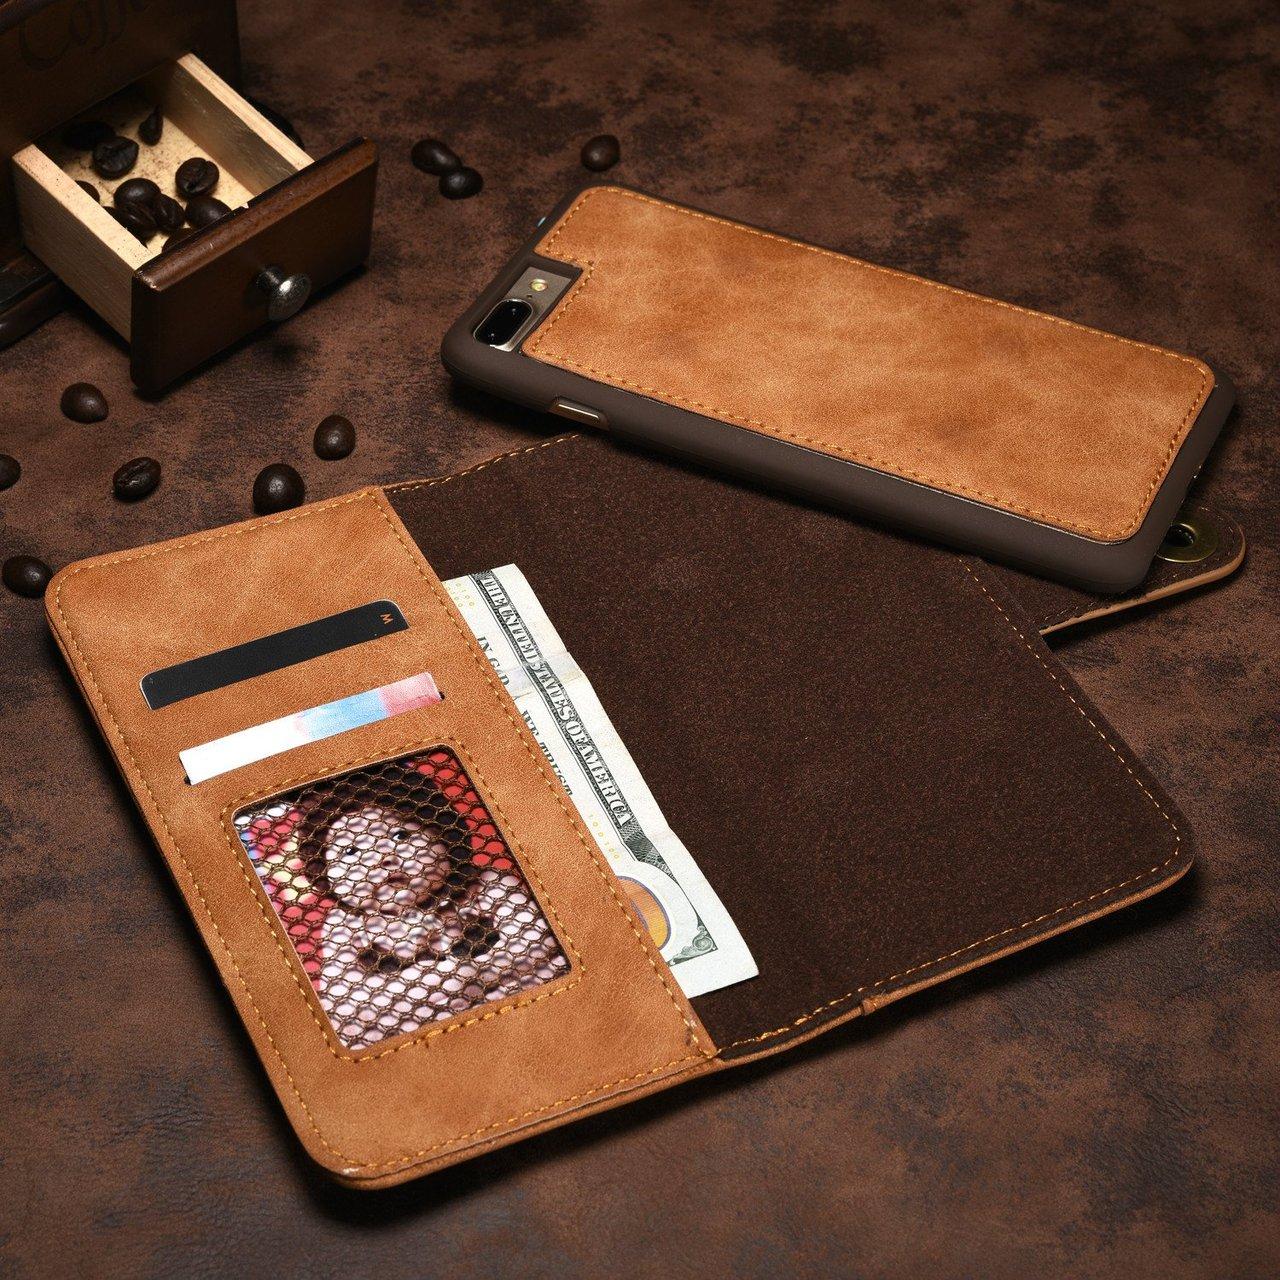 Retro Khaki iPhone Wallet Case